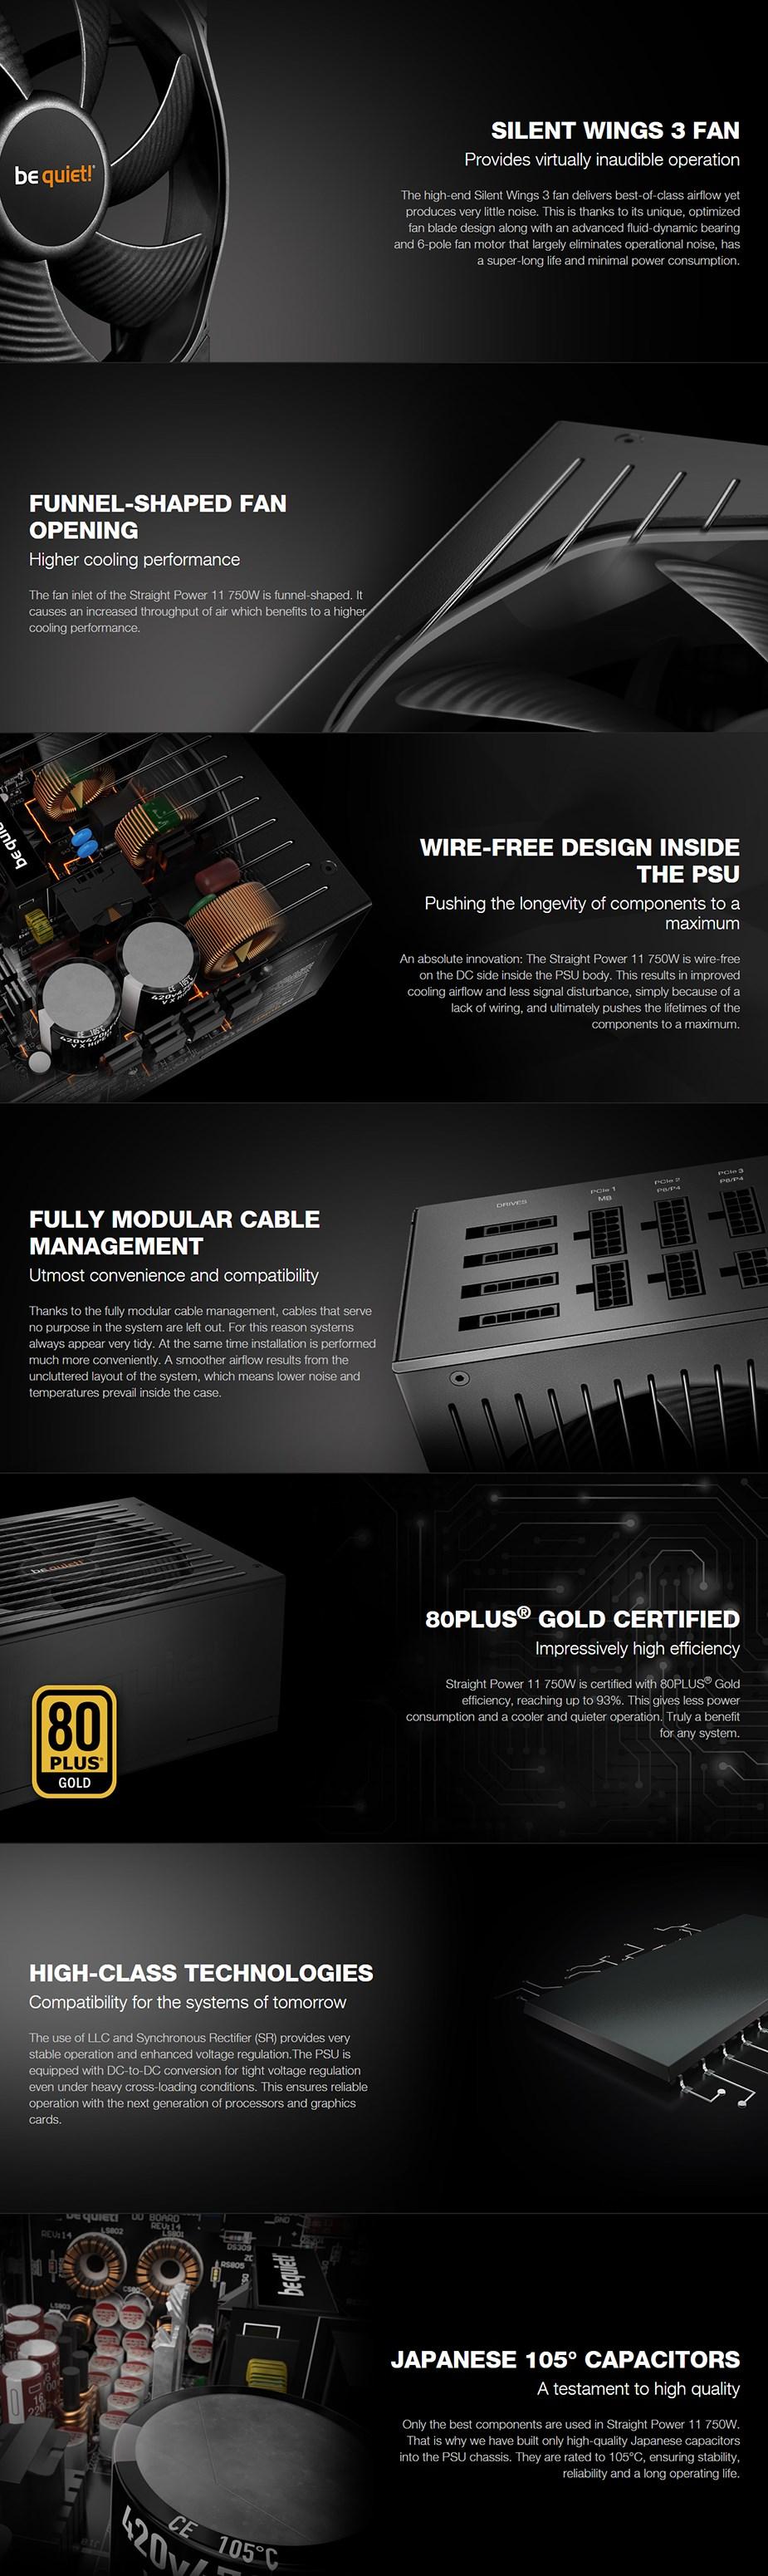 be quiet! Straight Power 11 750W 80+ Gold Modular Power Supply - Desktop Overview 1